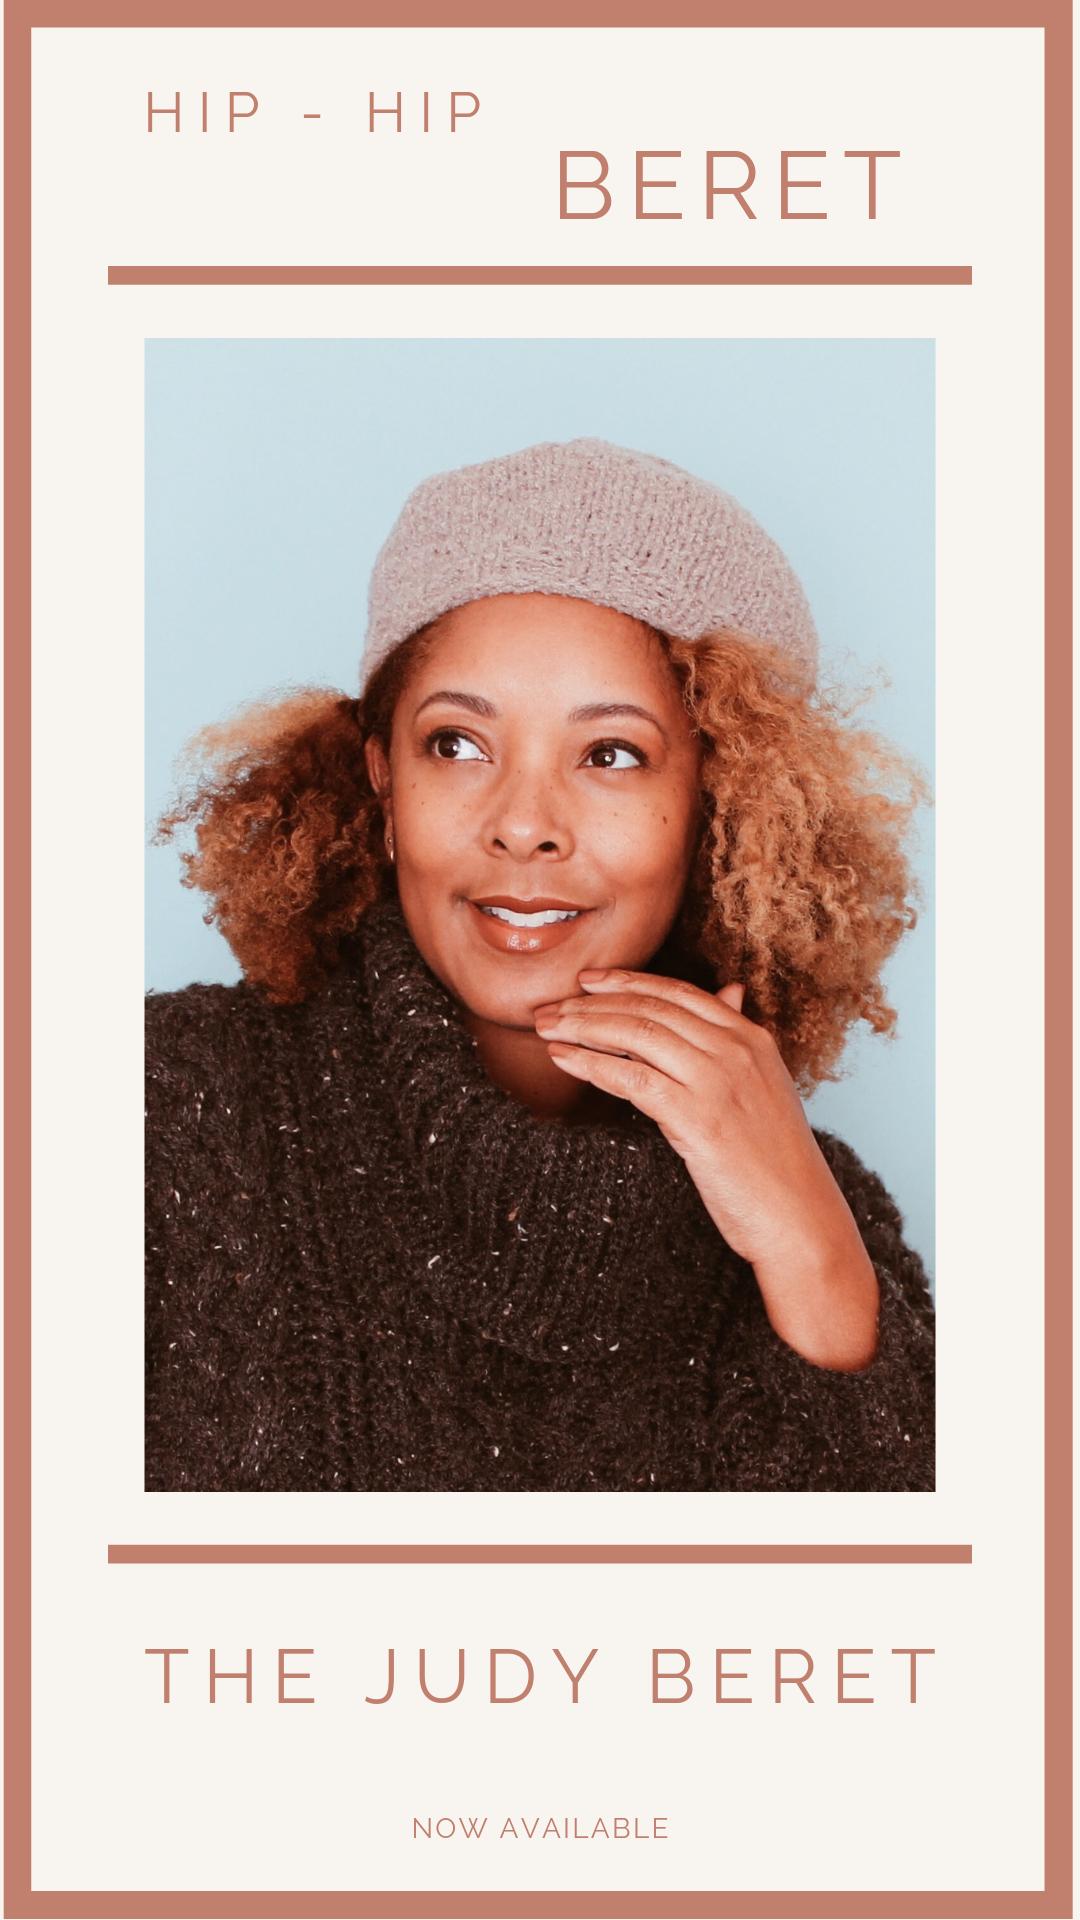 The Judy Beret - Website Marketing-4.png